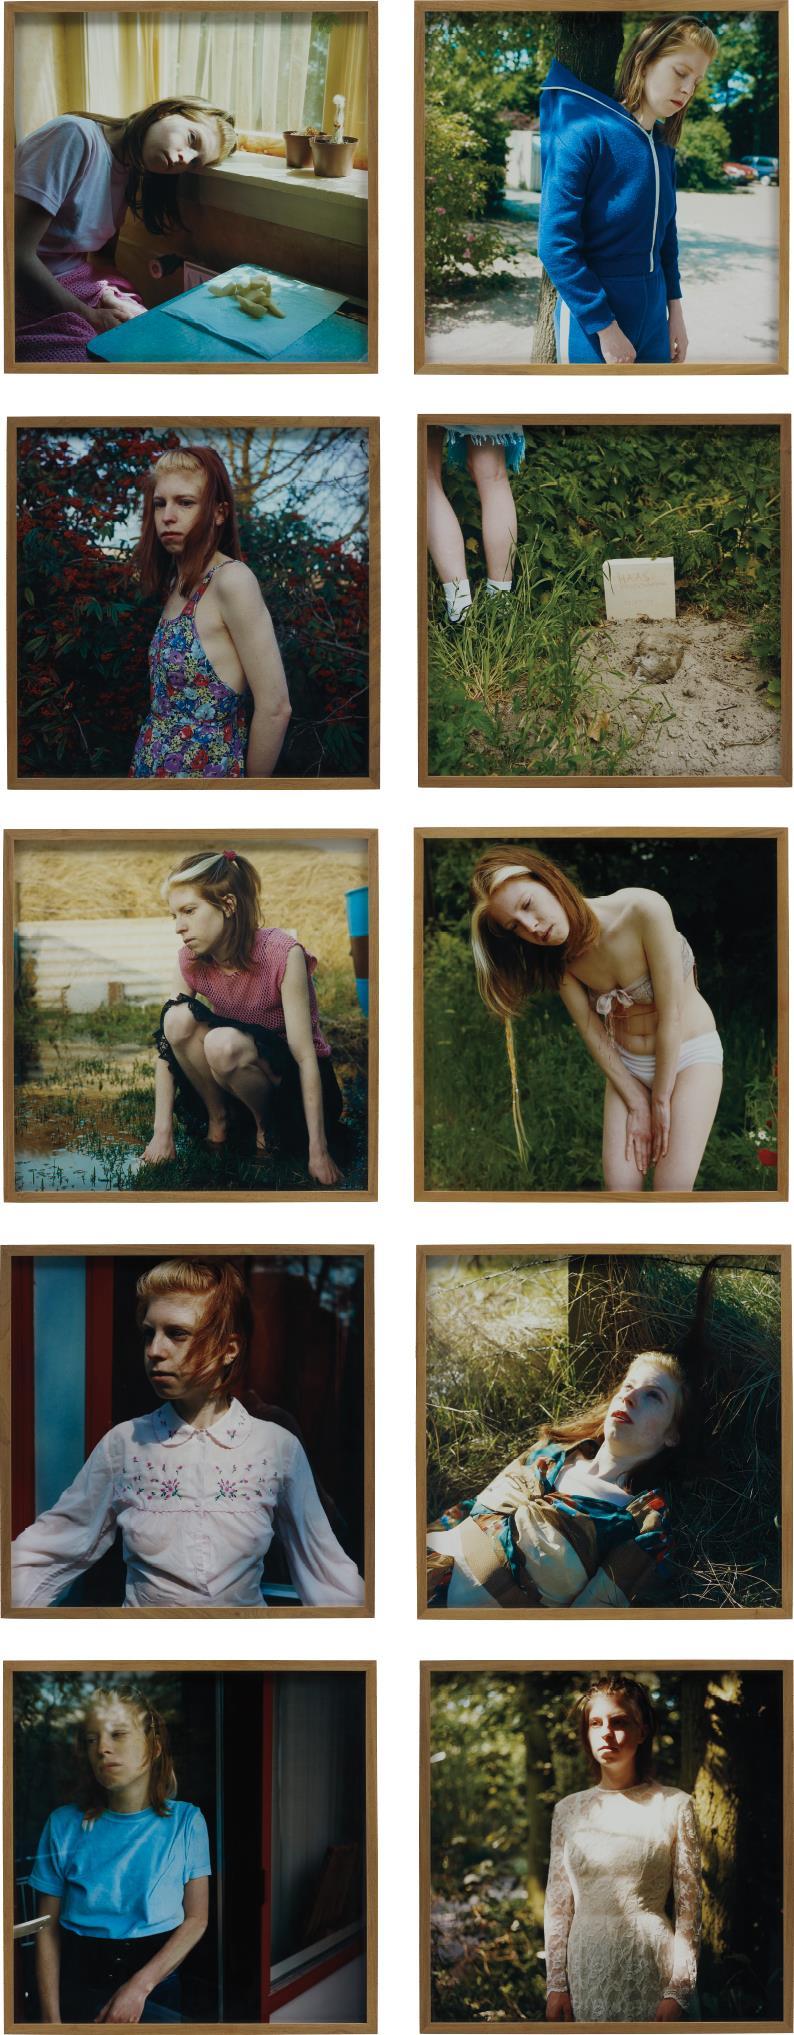 Hellen van Meene-Untitled (The Barbara Series)-1999